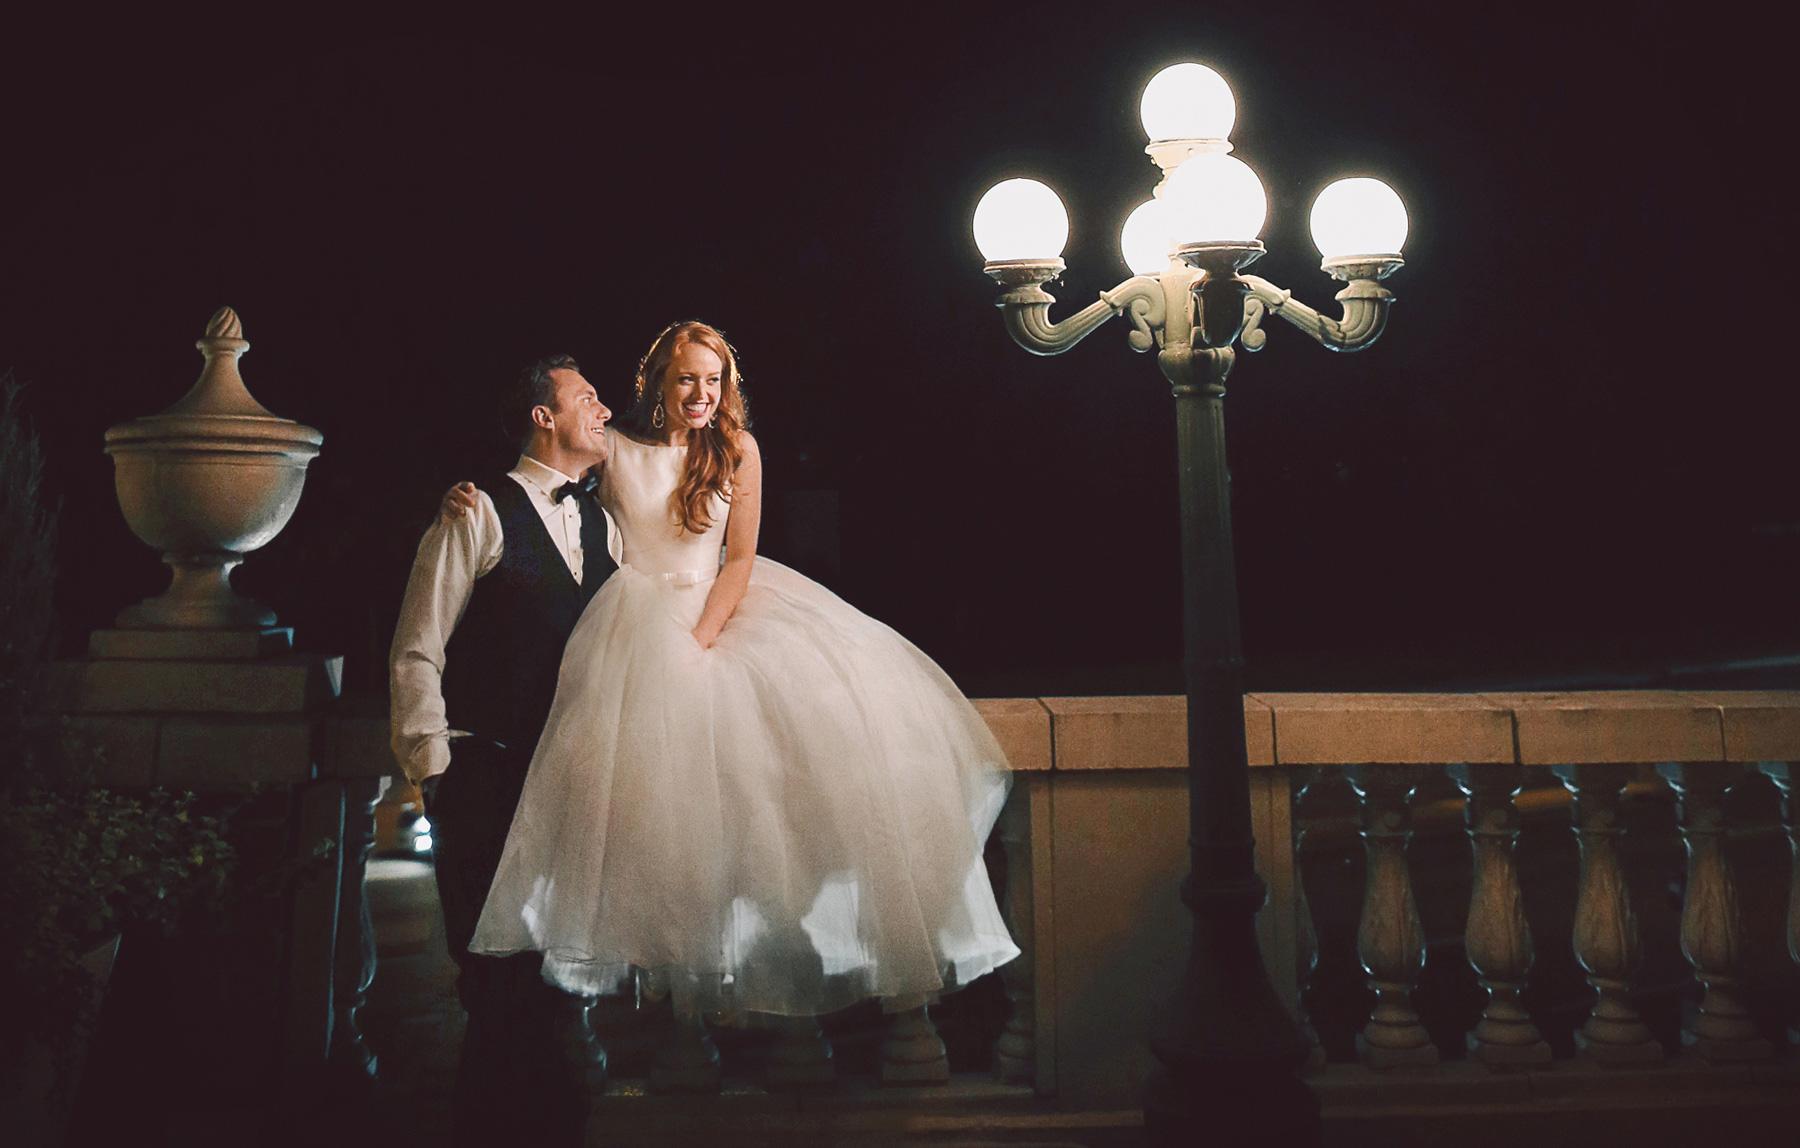 32-Minneapolis-Minnesota-Wedding-Photographer-by-Andrew-Vick-Photography-Fall-Autumn-Calhoun-Beach-Club-Reception-Bride-Groom-Terrace-Night-Vintage-Kristy-and-Jack.jpg